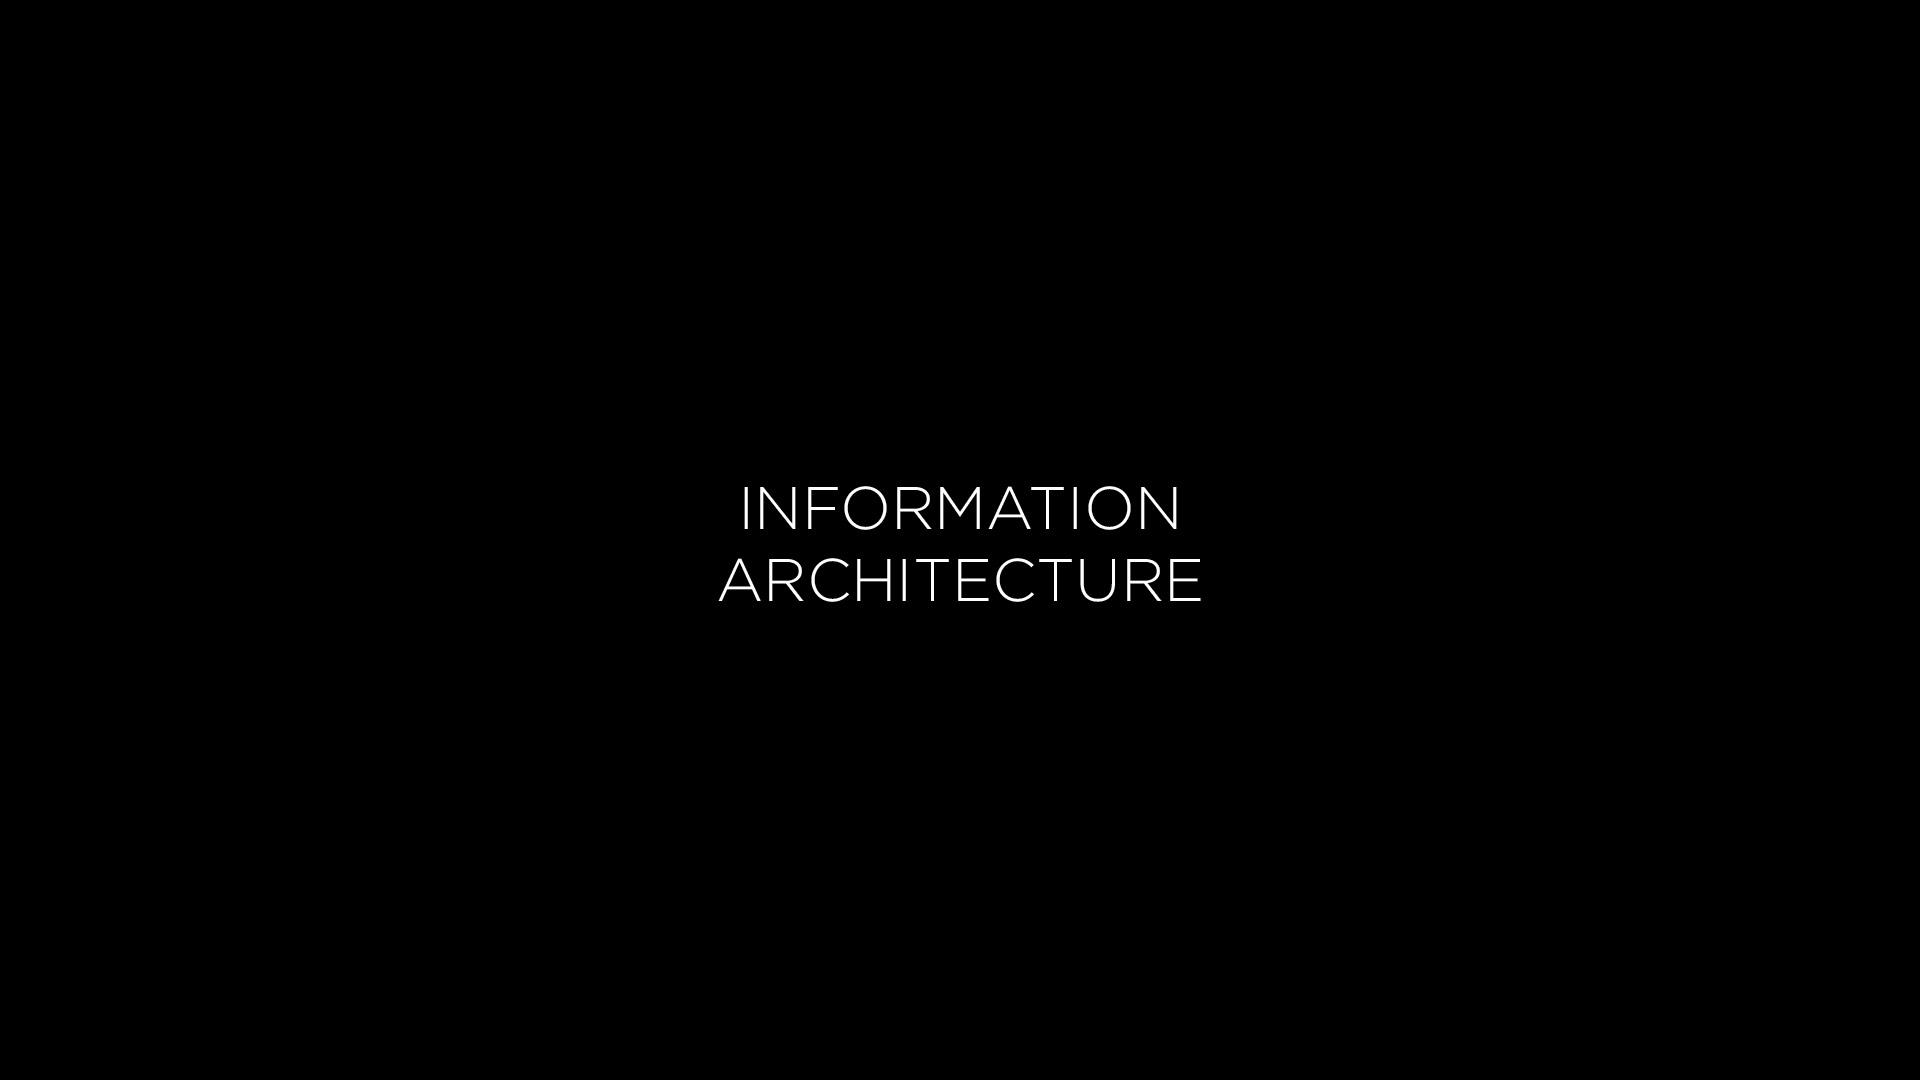 UXD38-NanaMarin-Invision-Update211